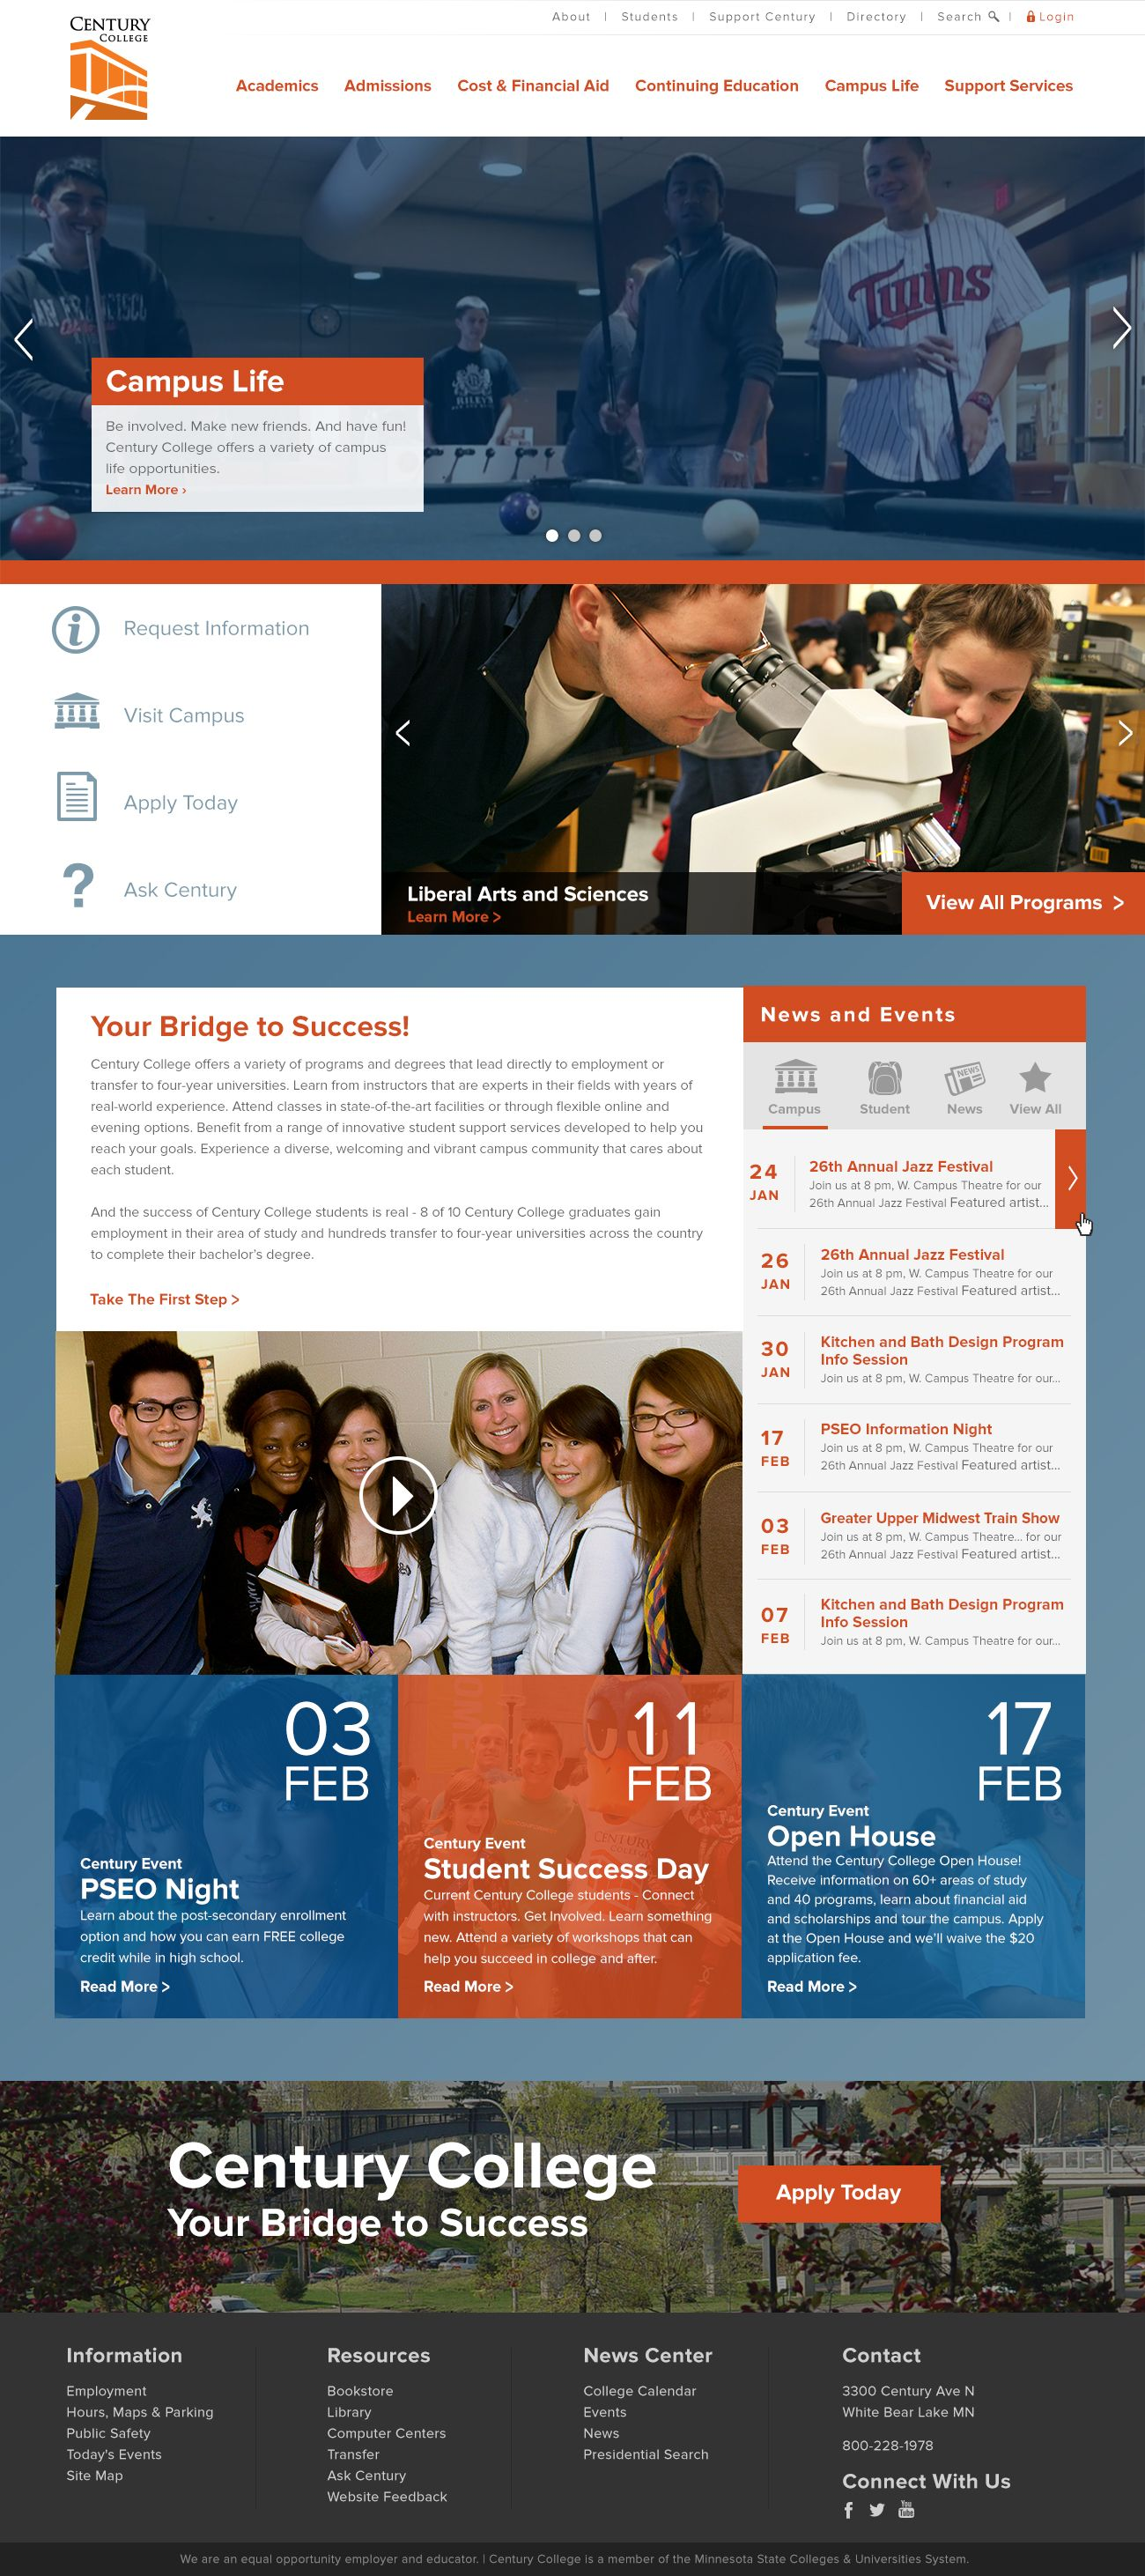 Century College Website Webdesign Rocket55designs Rocket55 Digital Mpls Mn Web Design User Experience Design Student Success